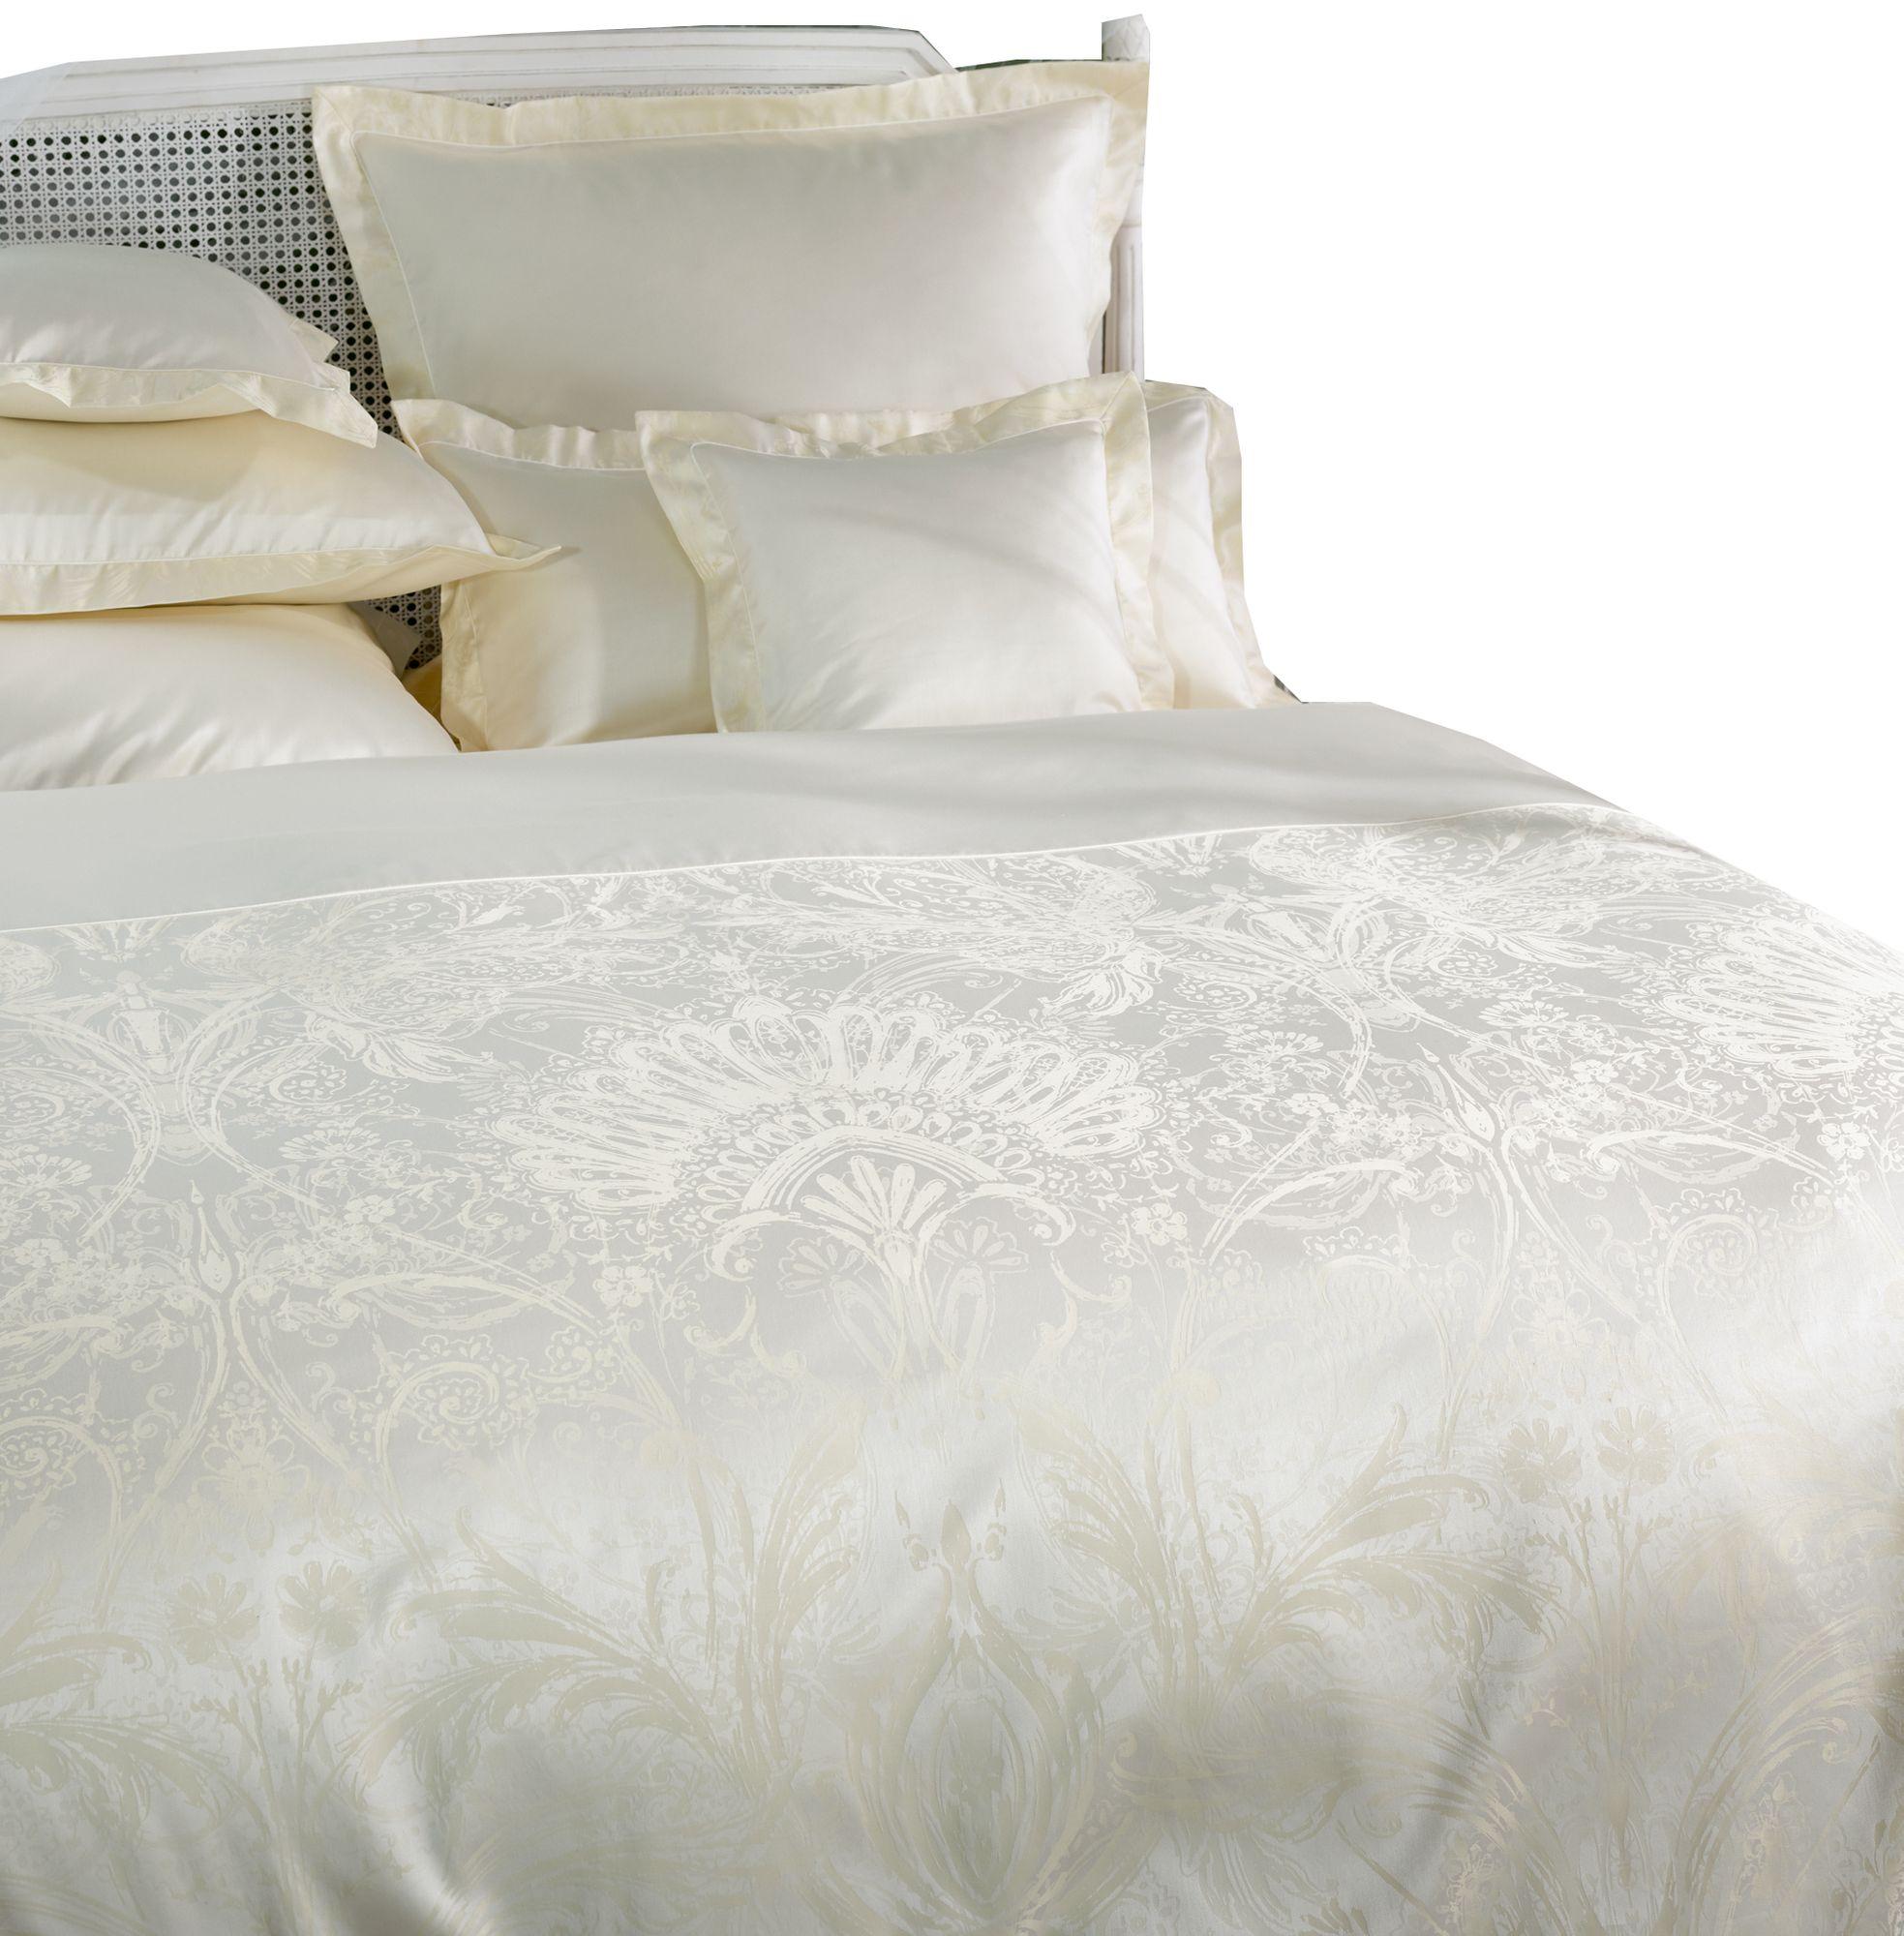 curt bauer mako brokat damast bettw sche avignon gr e 155x220 80x80 cm farbe champagner. Black Bedroom Furniture Sets. Home Design Ideas